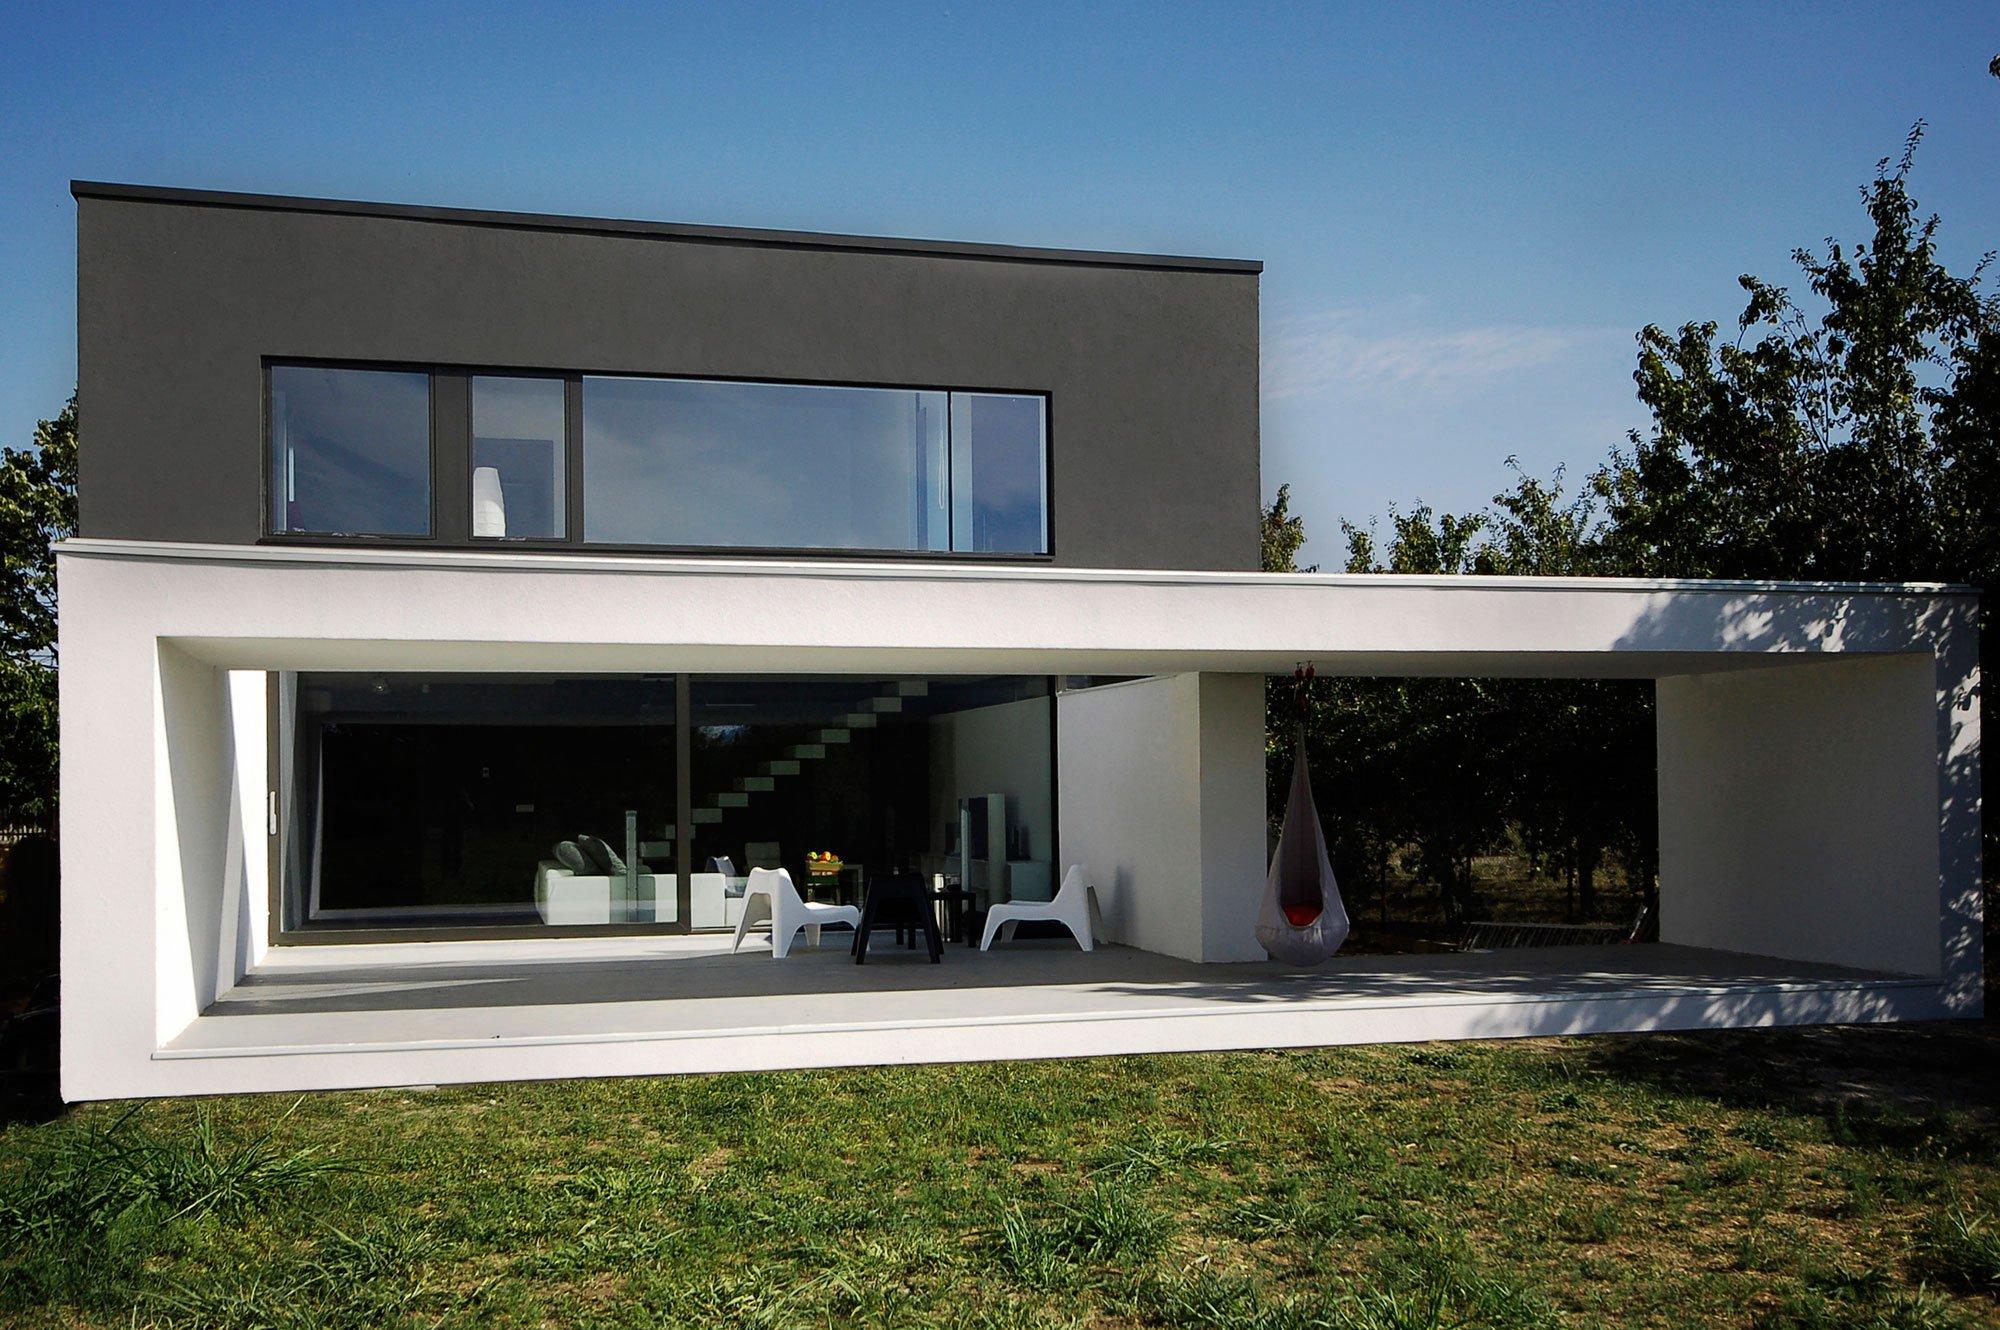 Dise o de casa moderna de dos plantas construye hogar for Colores para frentes de casas modernas